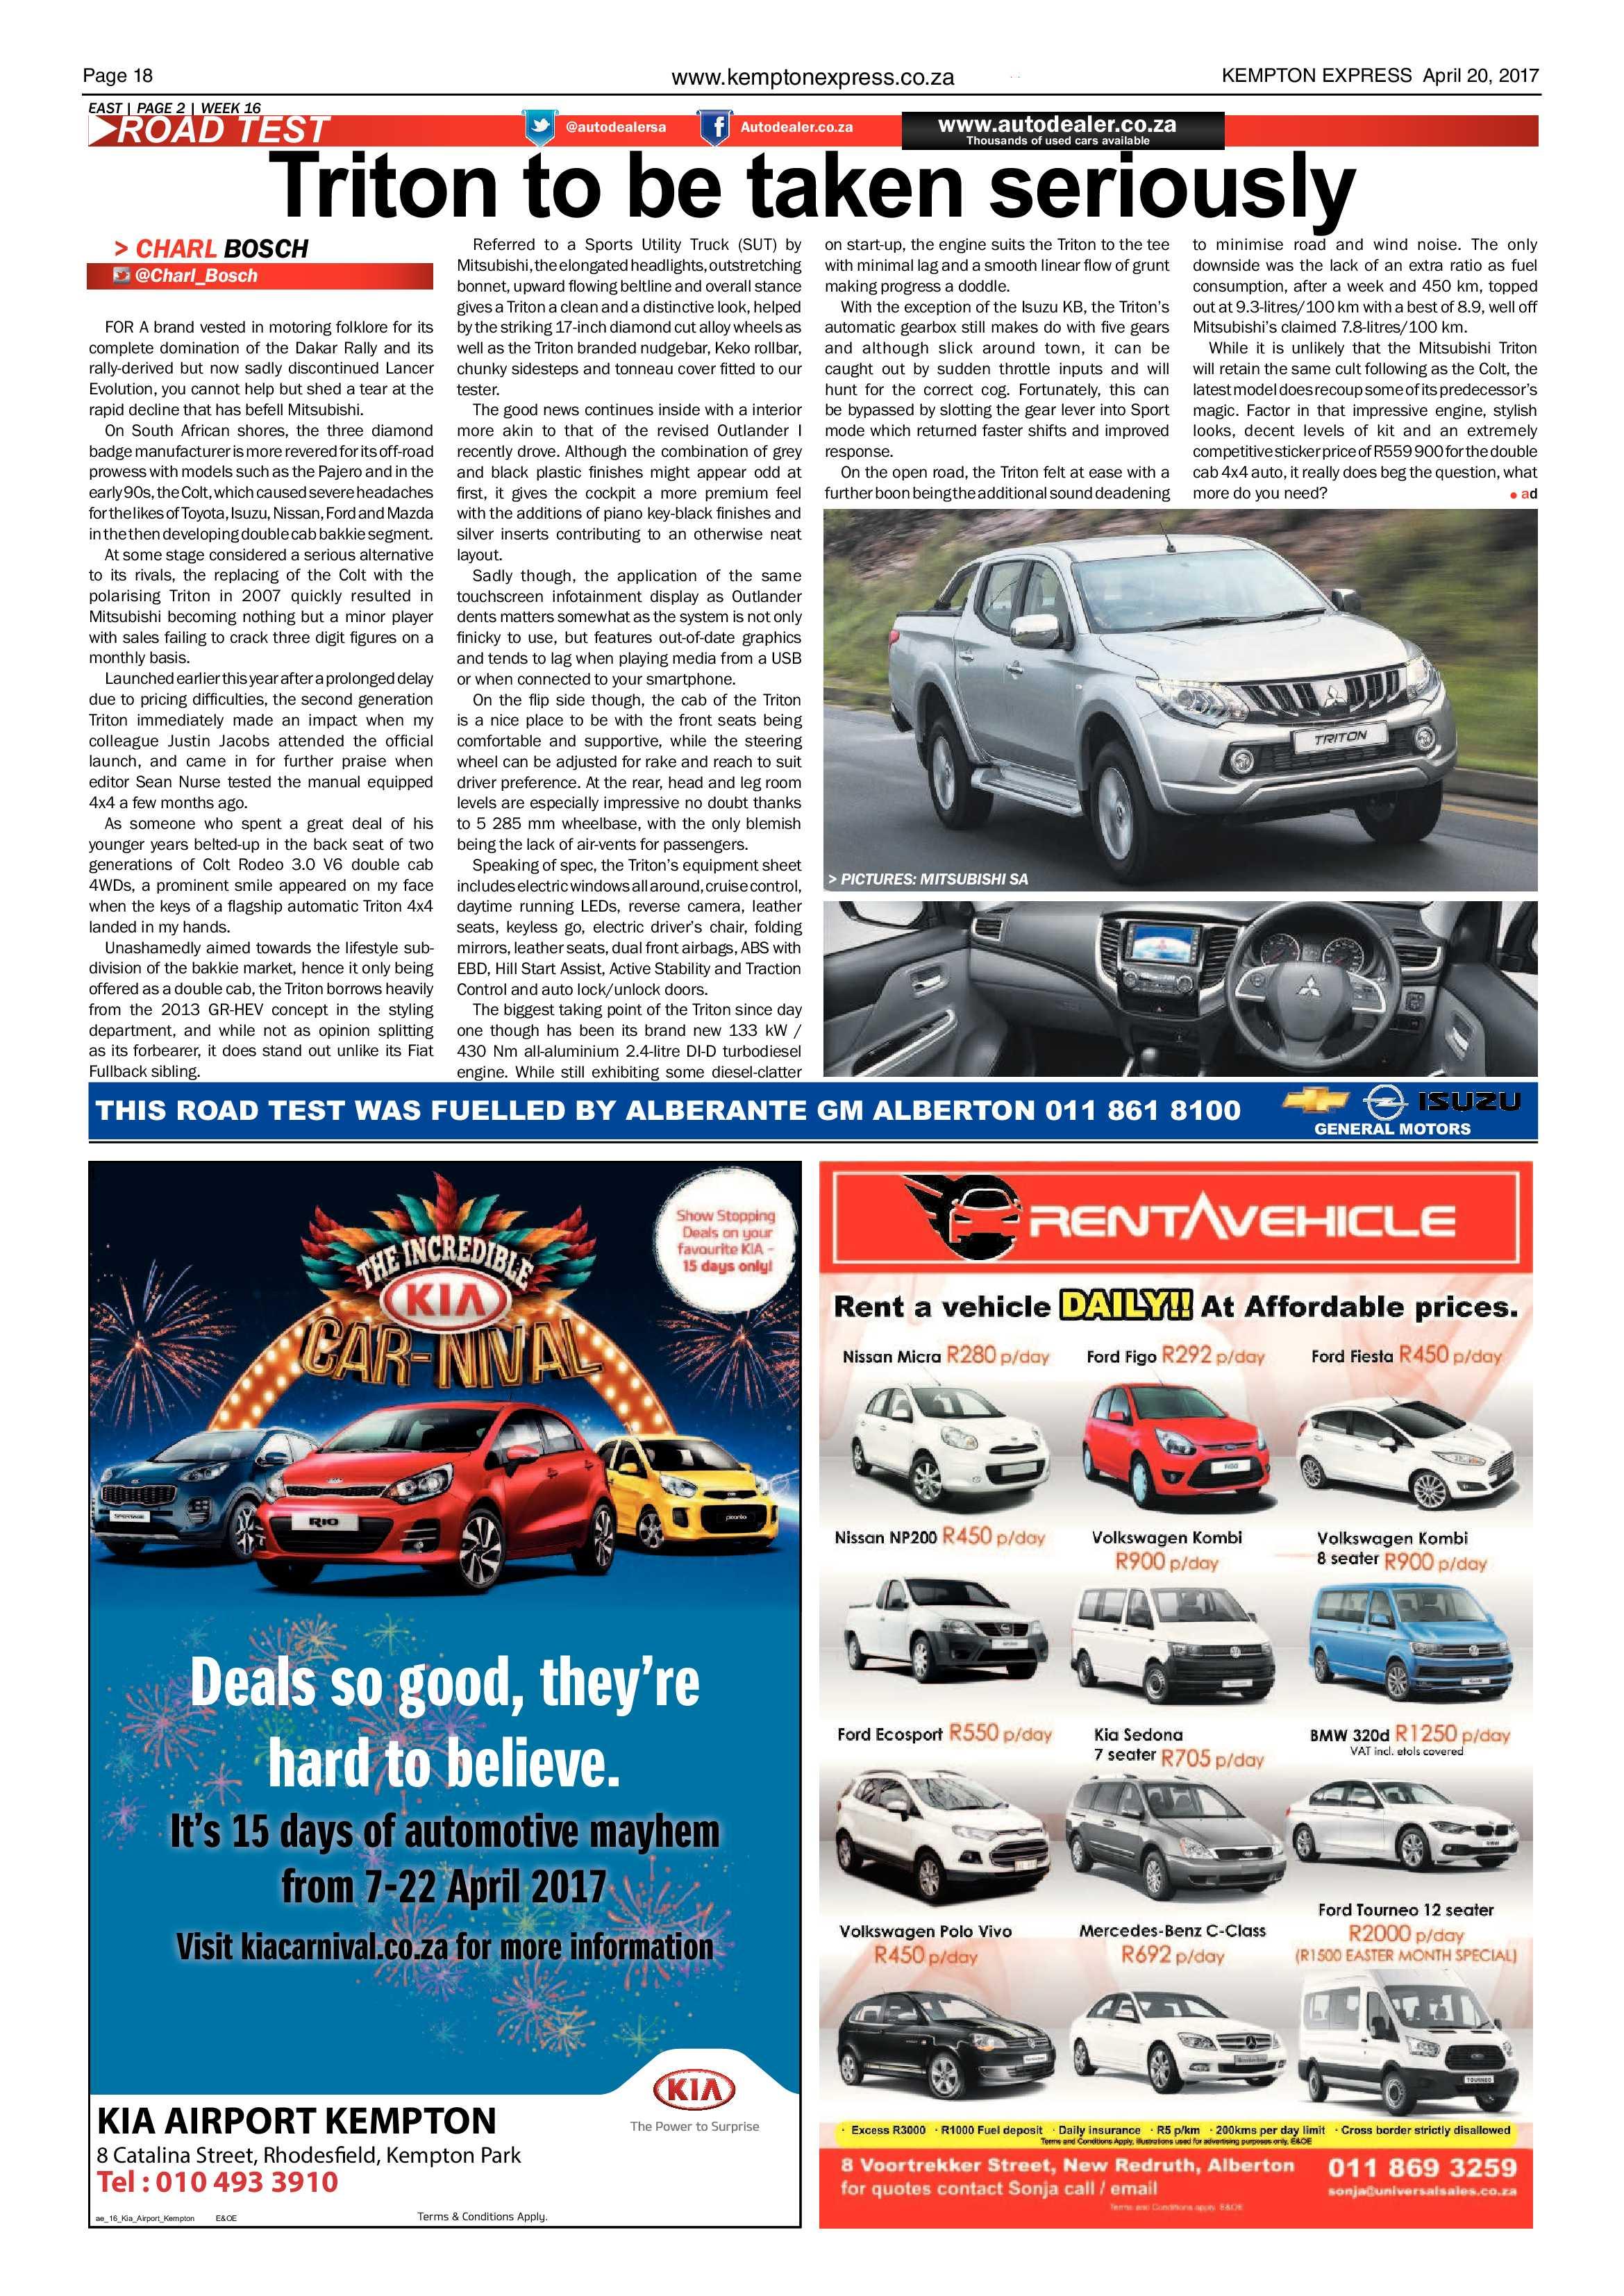 kempton-express-20-april-2017-epapers-page-18